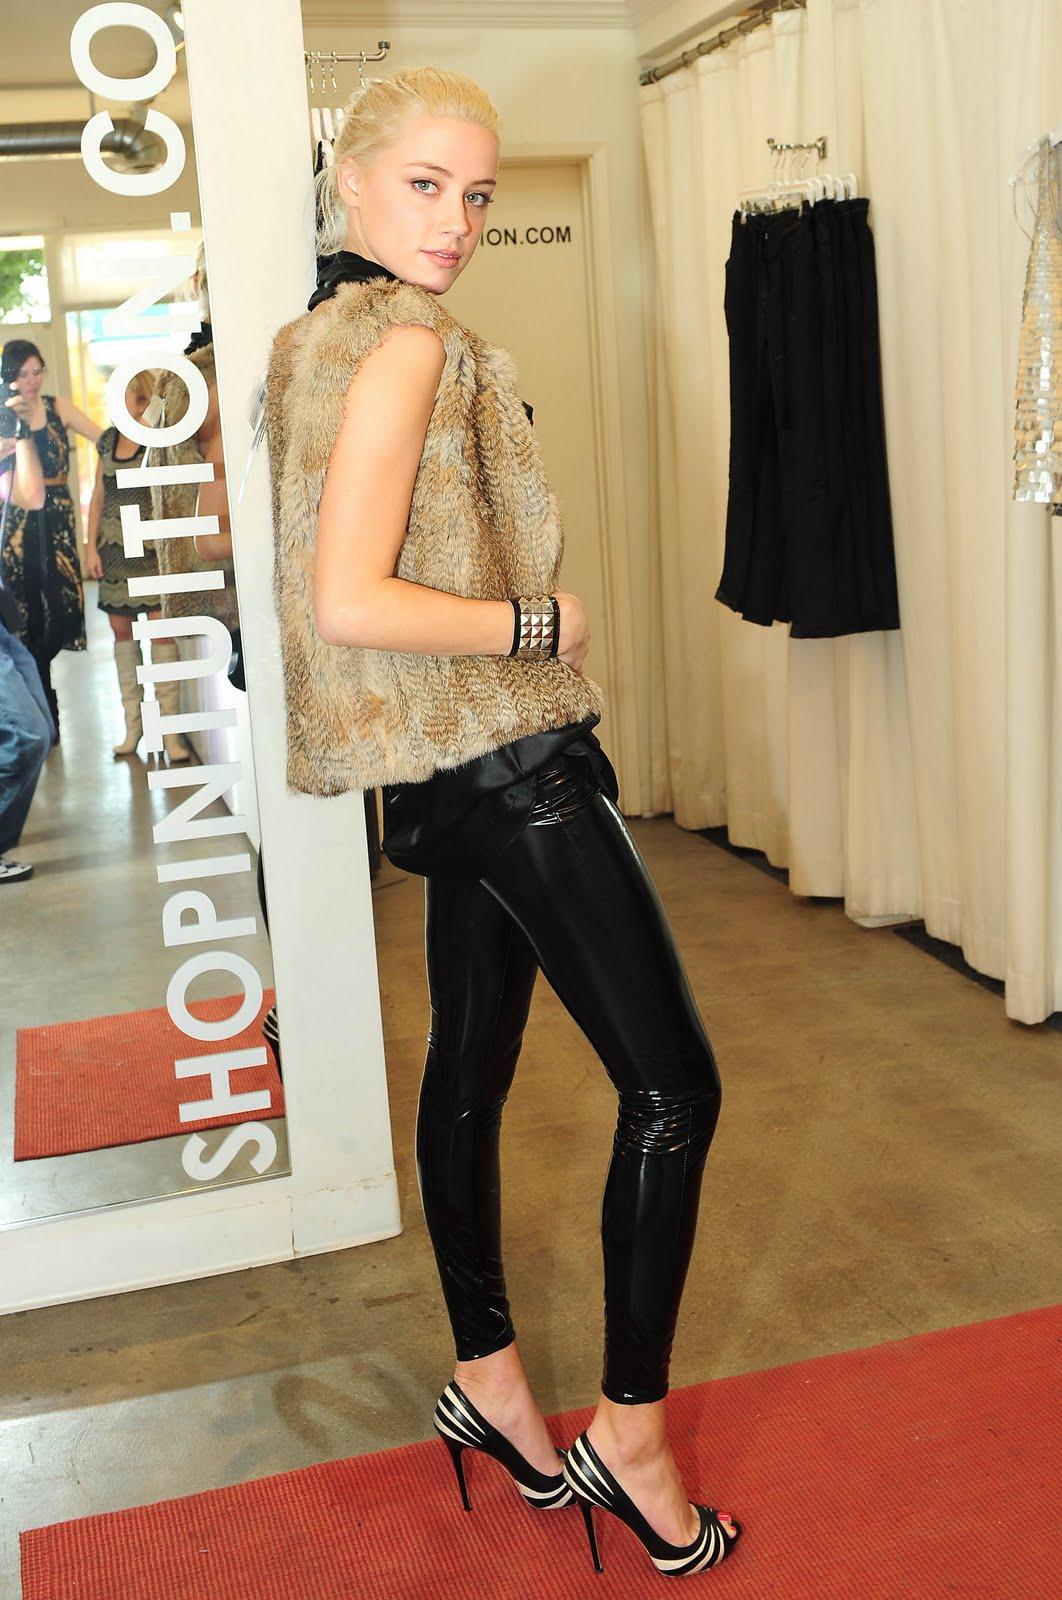 http://3.bp.blogspot.com/-REdPN2BTkac/ThvJMnzzMBI/AAAAAAAAAk0/ua9KLwWH7AE/s1600/63443_babayaga_Amber_Heard_shopping_at_Intuition_LA_11-06-2009_005_123_500lo.jpg